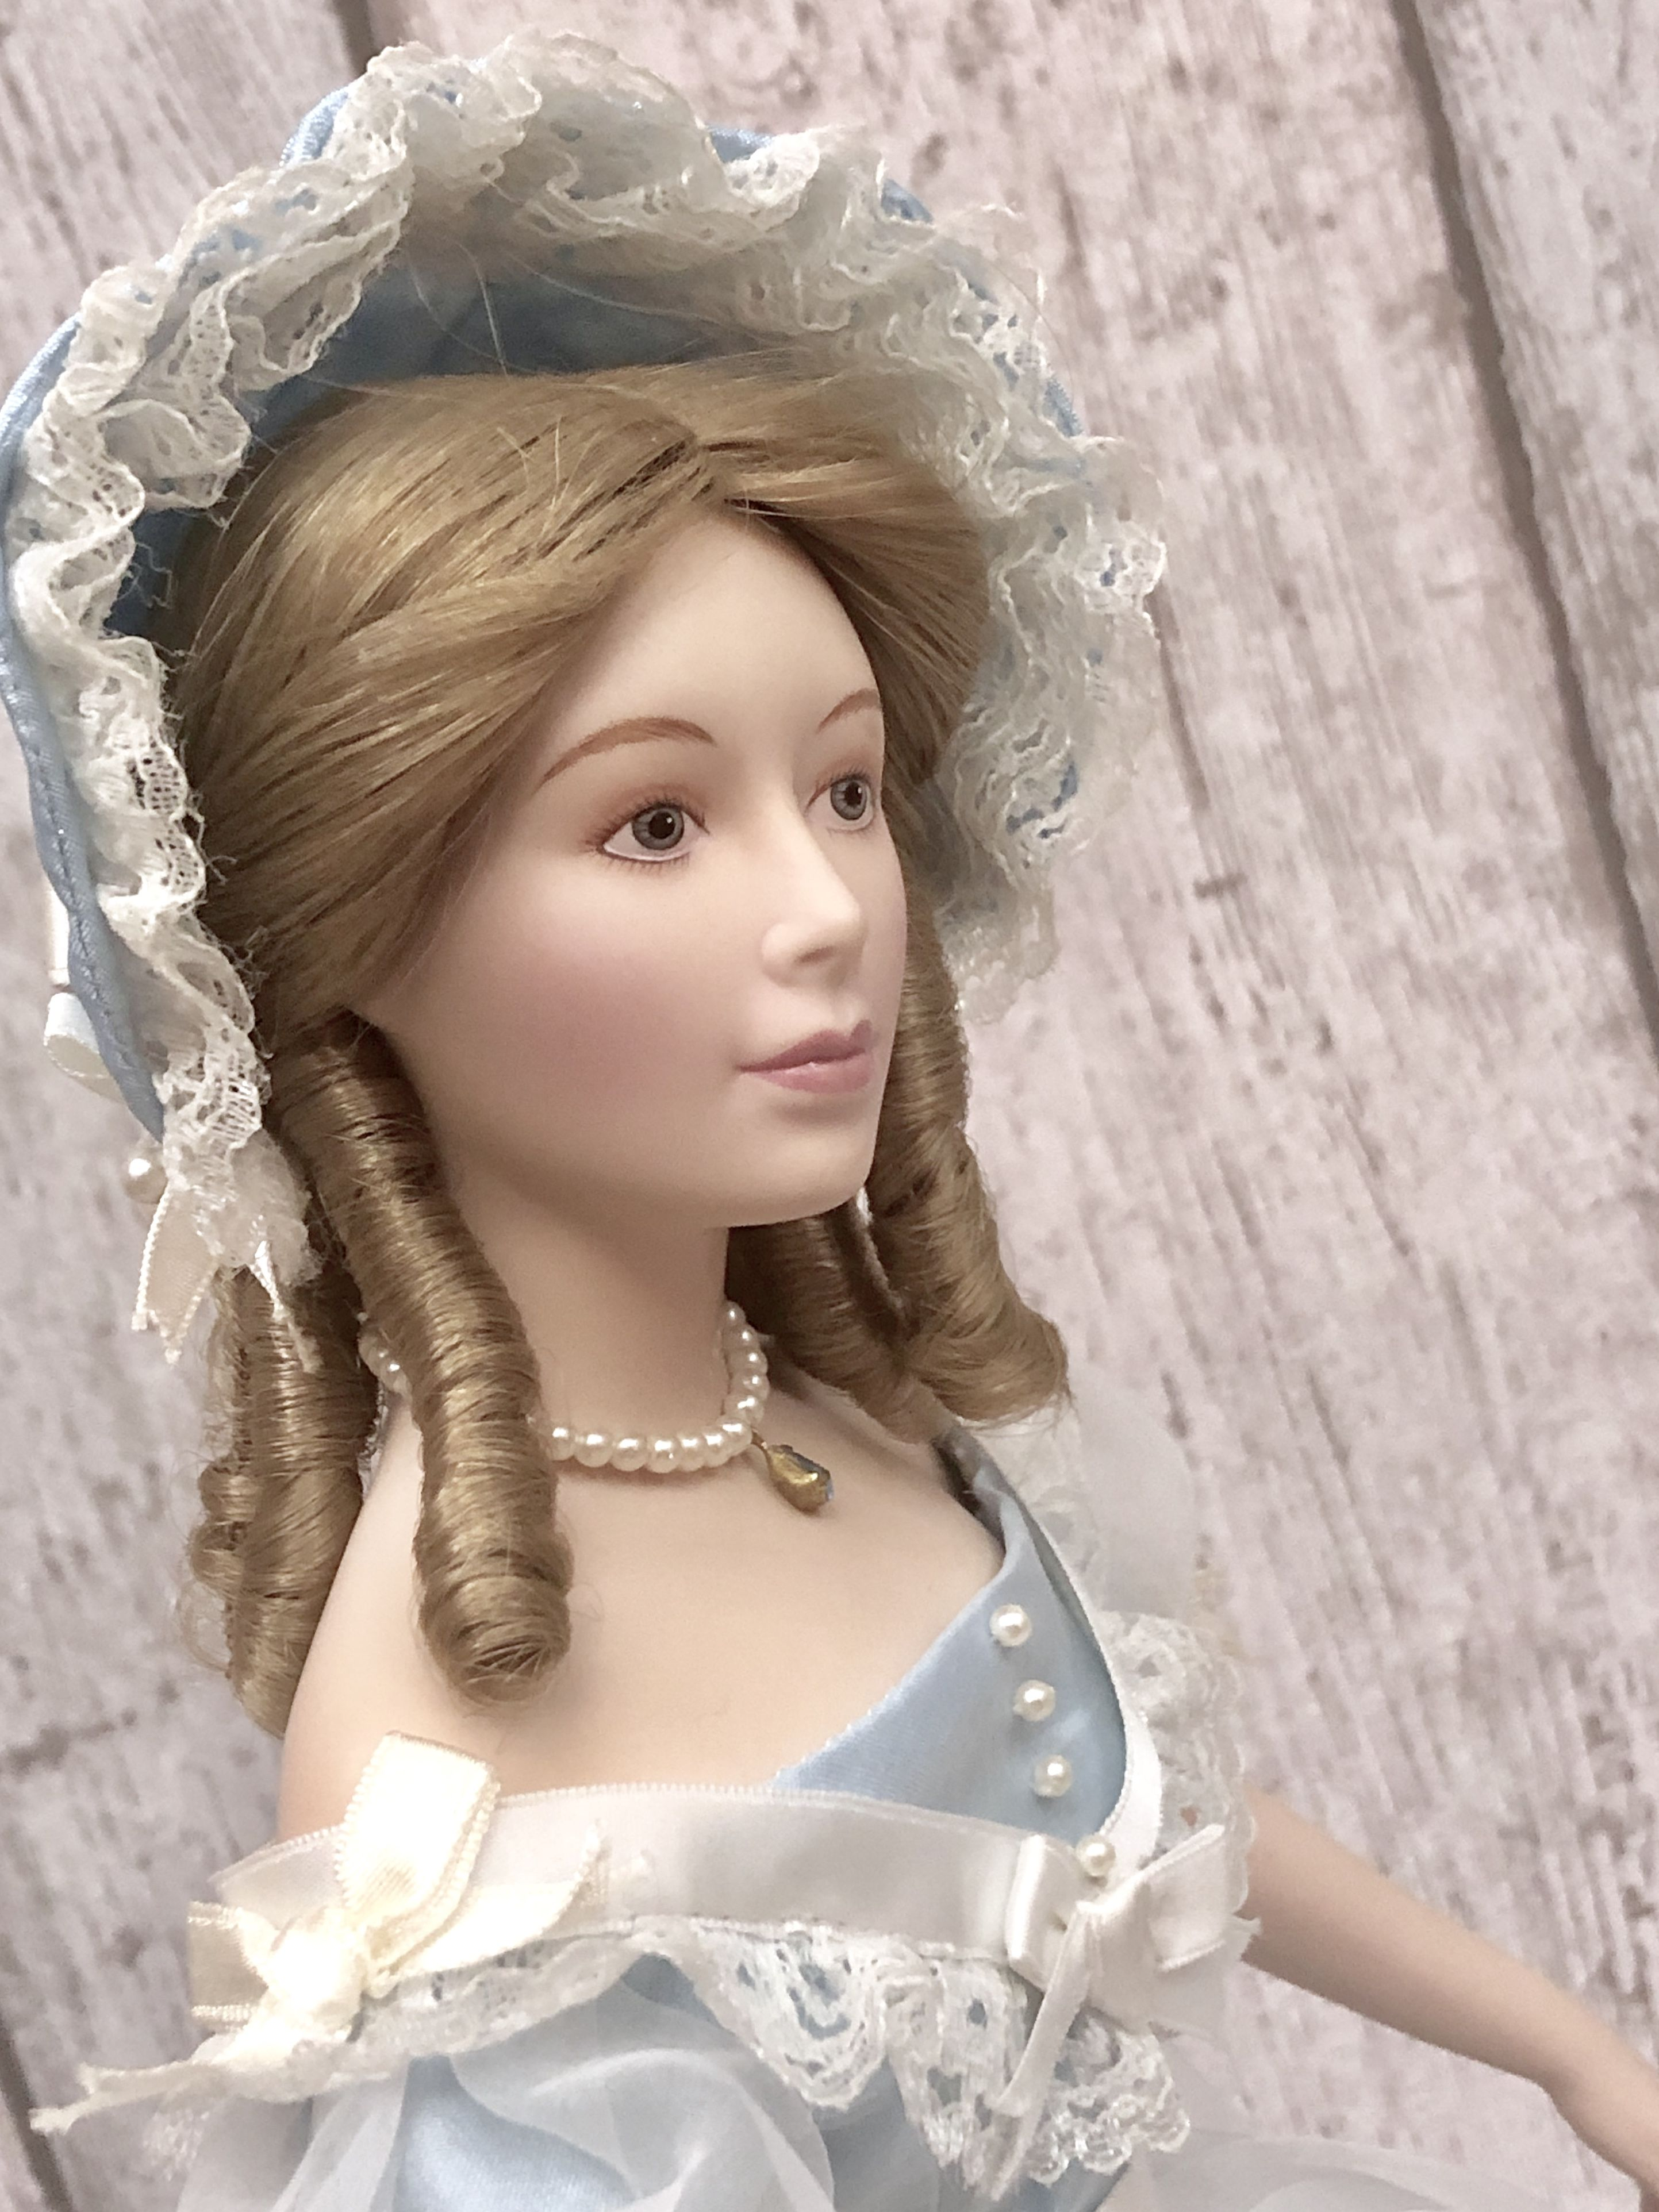 Poppy Parker: Believe in Me | Glam doll, Poppy parker